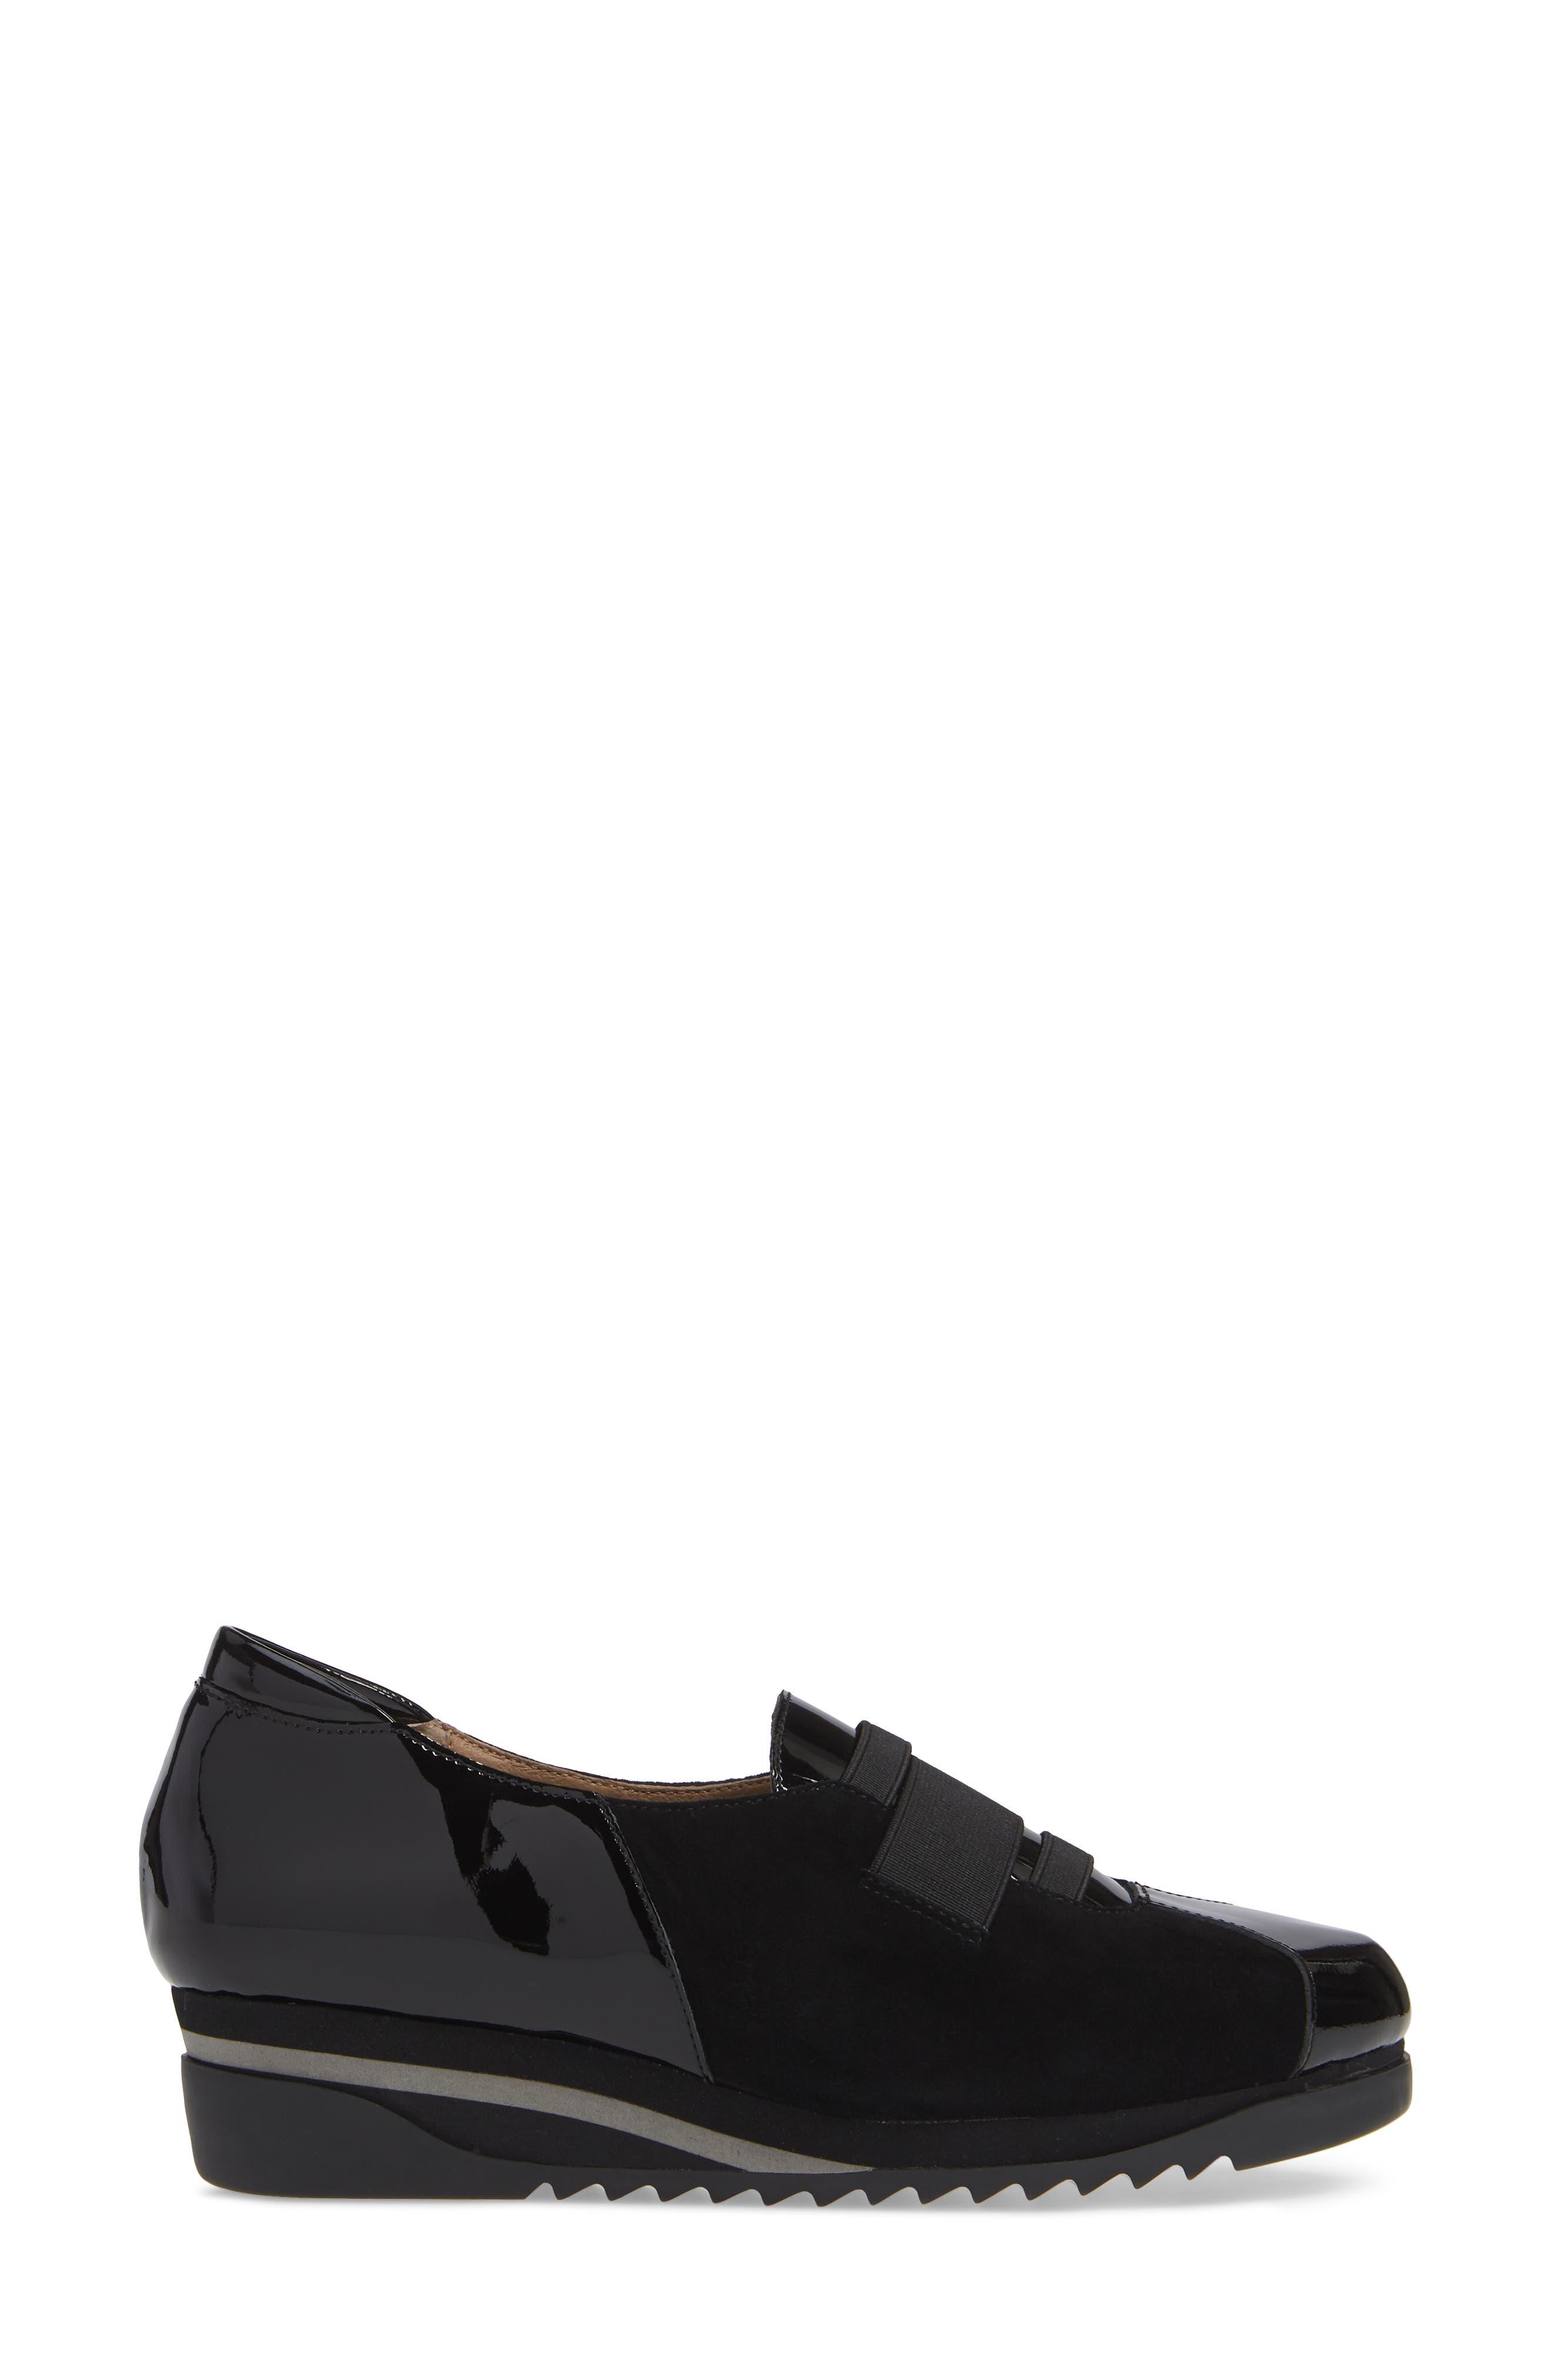 BETTYE MULLER CONCEPTS, Taytum Sneaker, Alternate thumbnail 3, color, BLACK SUEDE